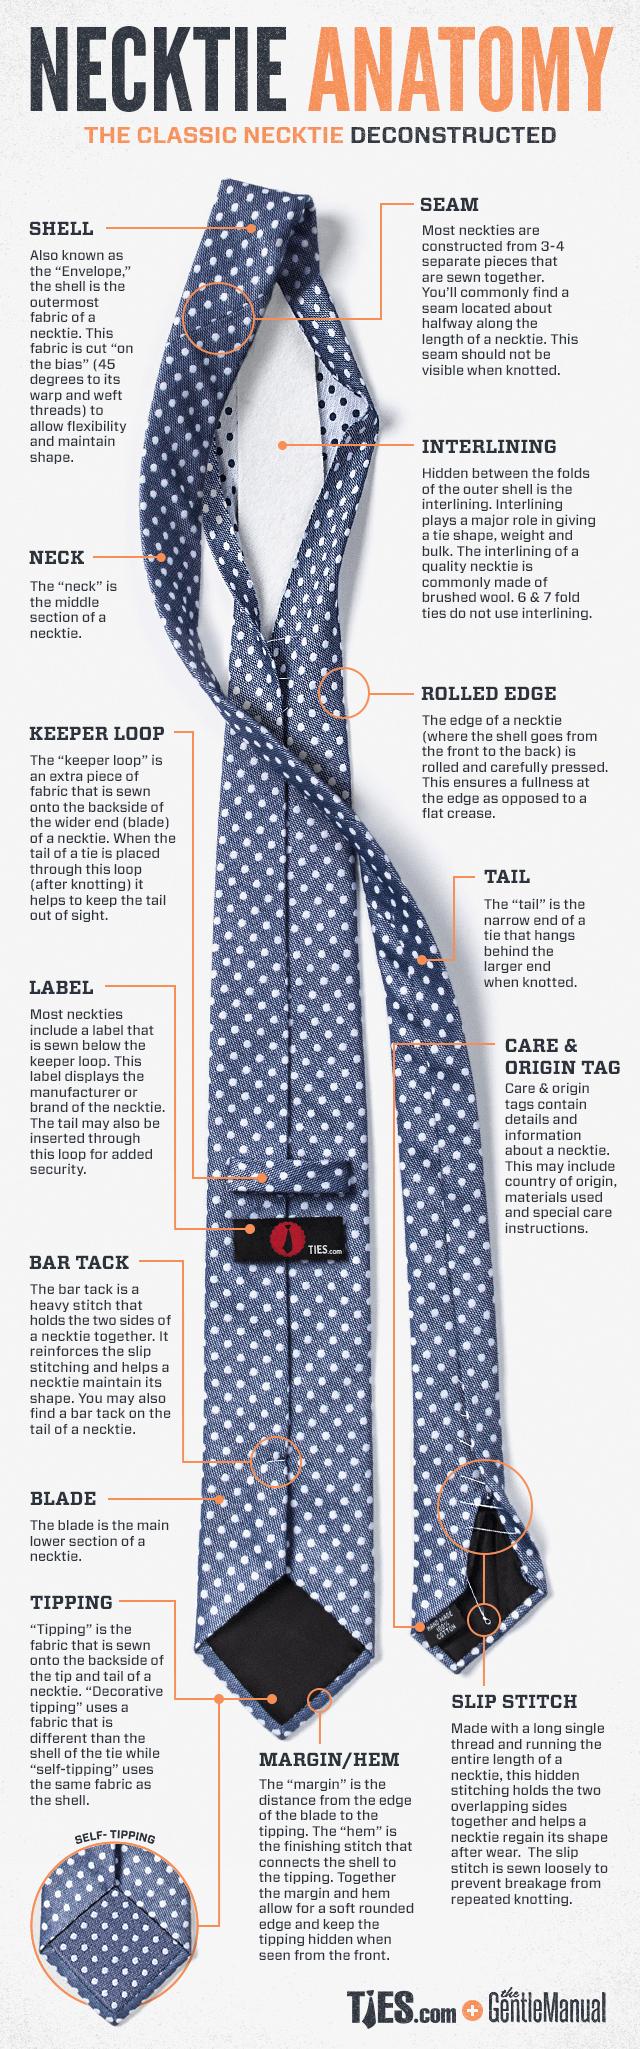 Necktie Anatomy: The Classic Necktie Deconstructed -